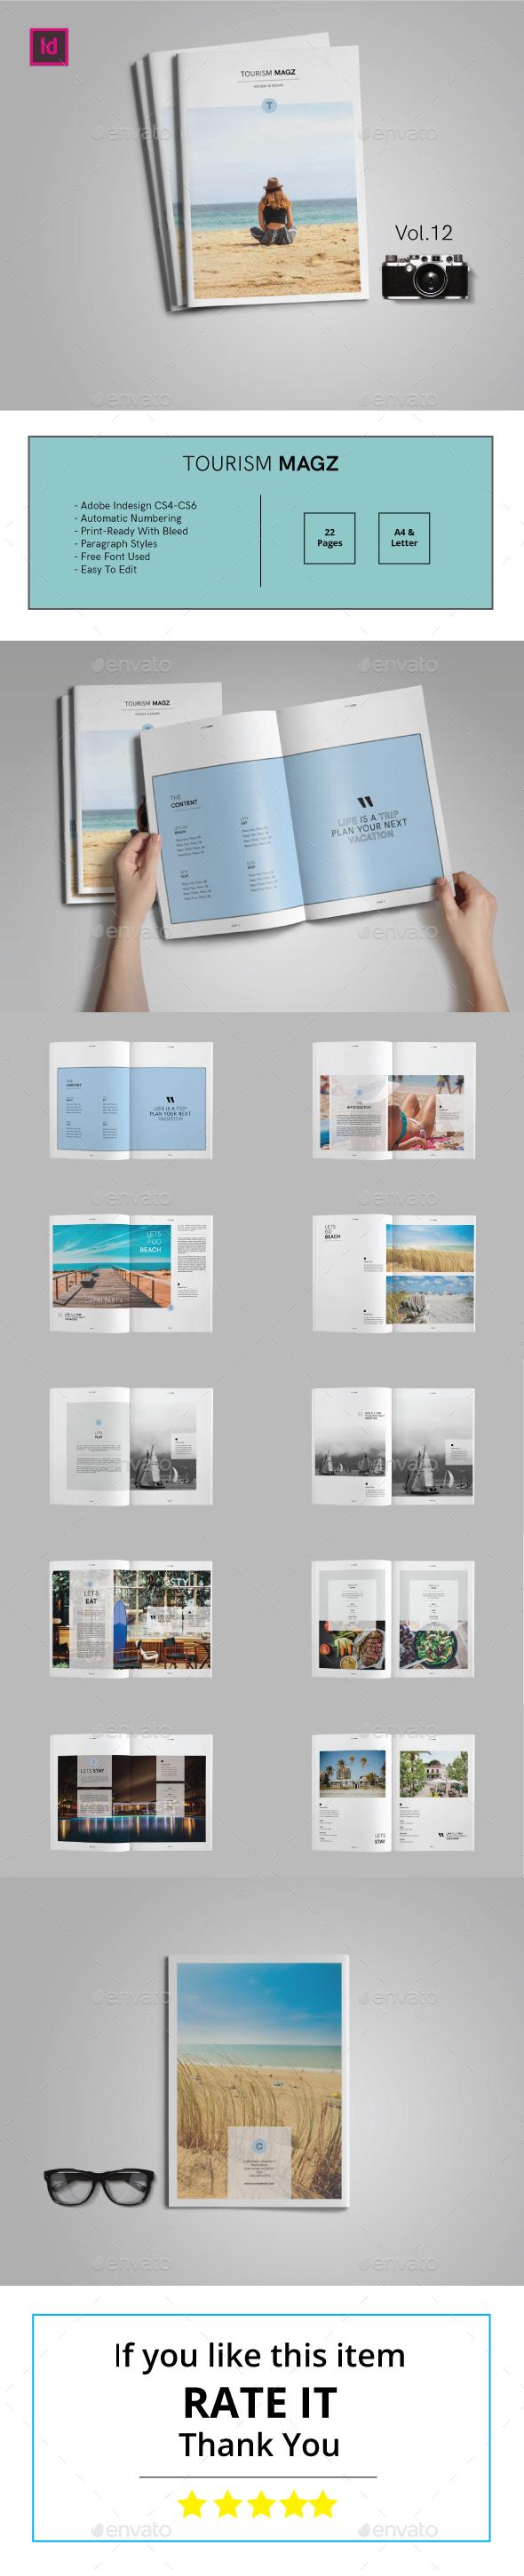 Tourism Magz Vol.12 - Magazines Print Templates